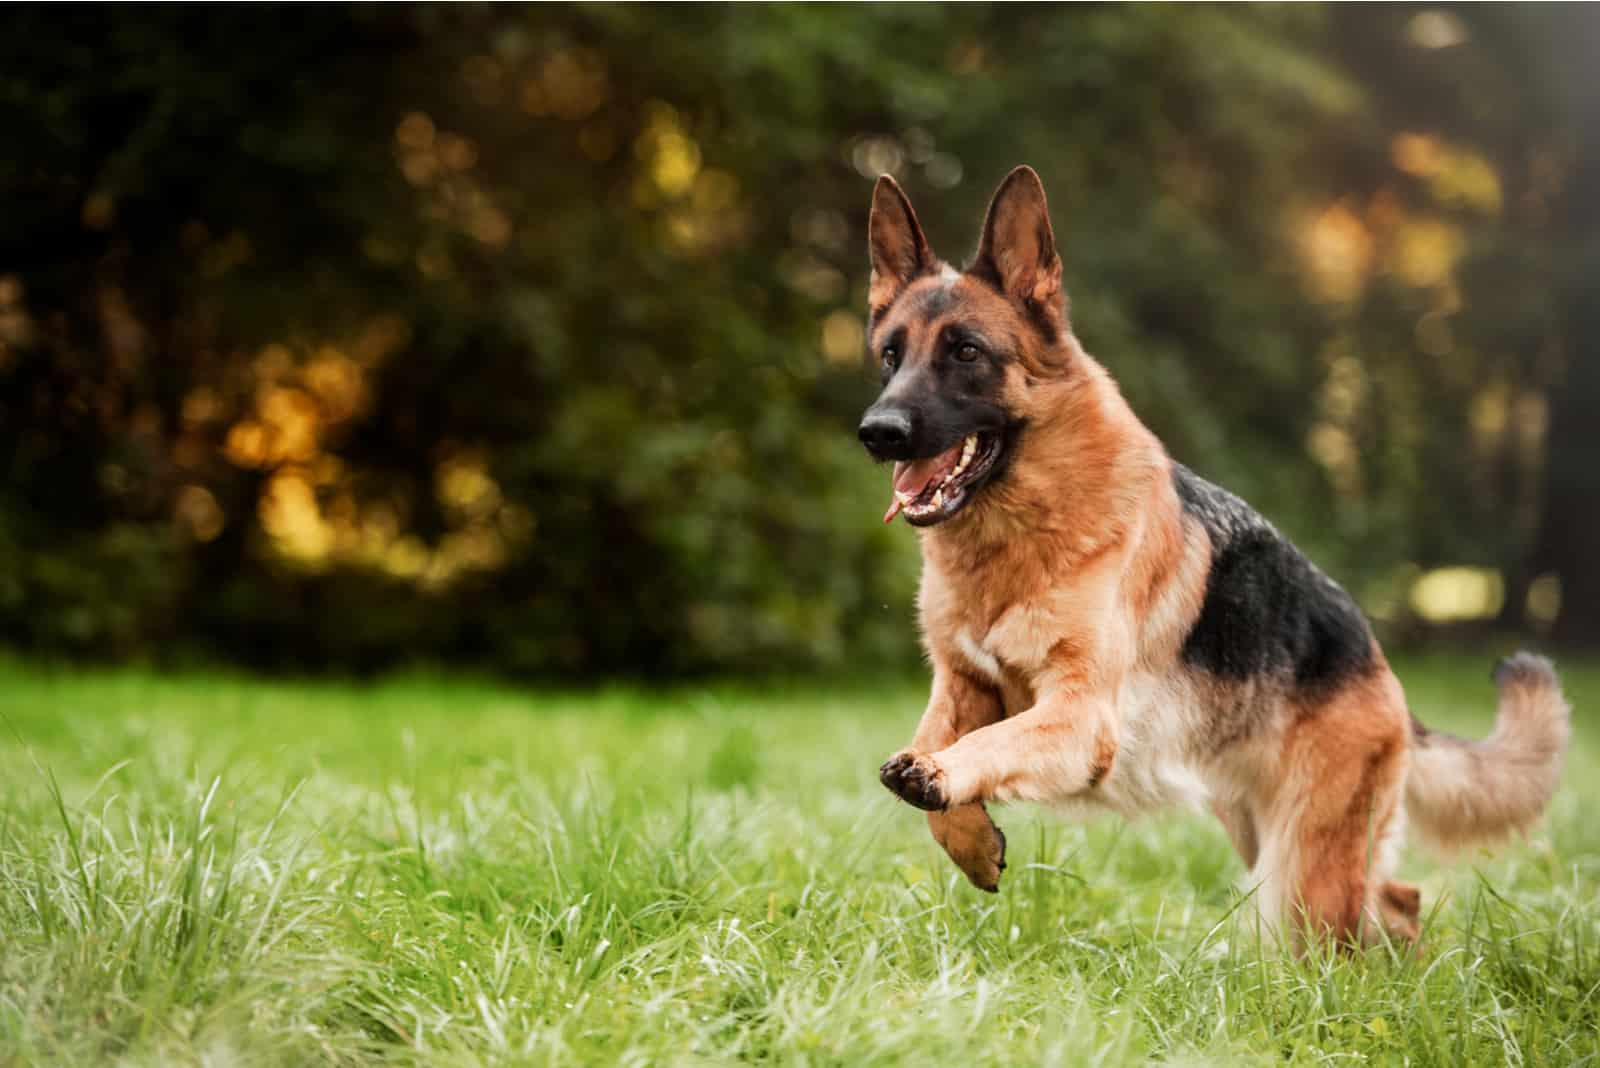 a German Shepherd runs in the park